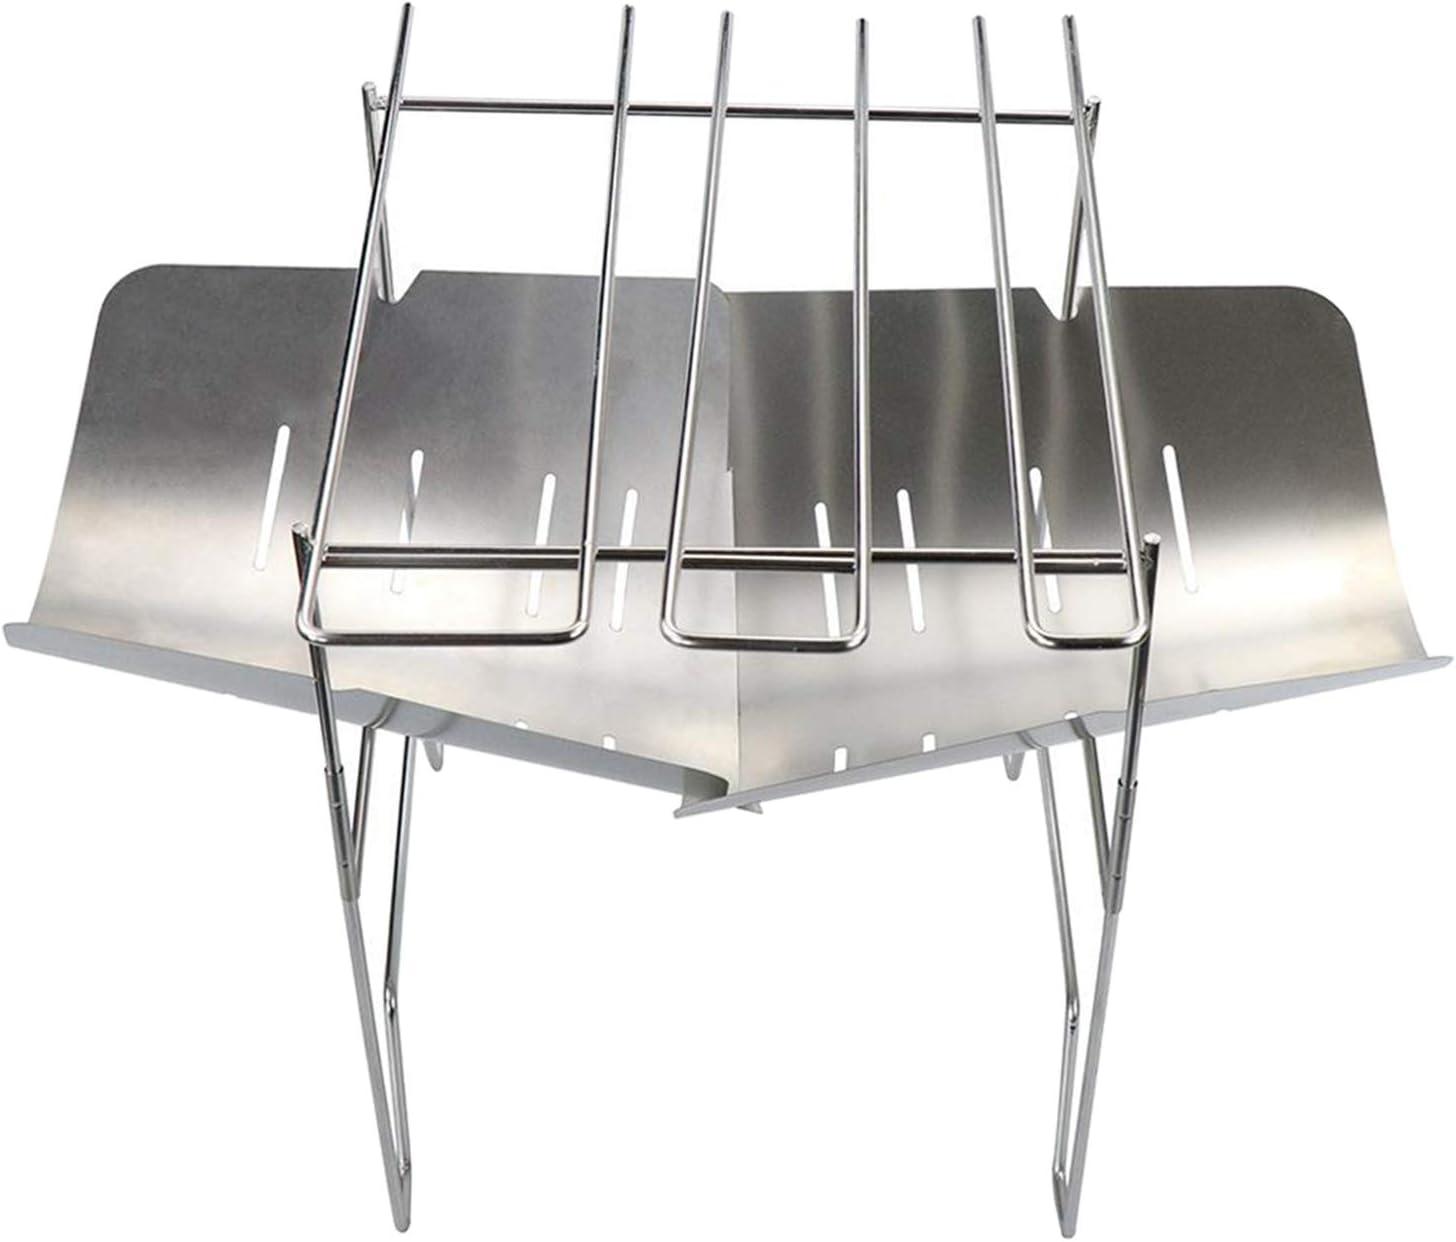 freneci Foldable Compact Barbecue BBQ Grill Charcoal Stove Shish Kabob Camping Cooker - 2Pcs Stove+BBQ Stick